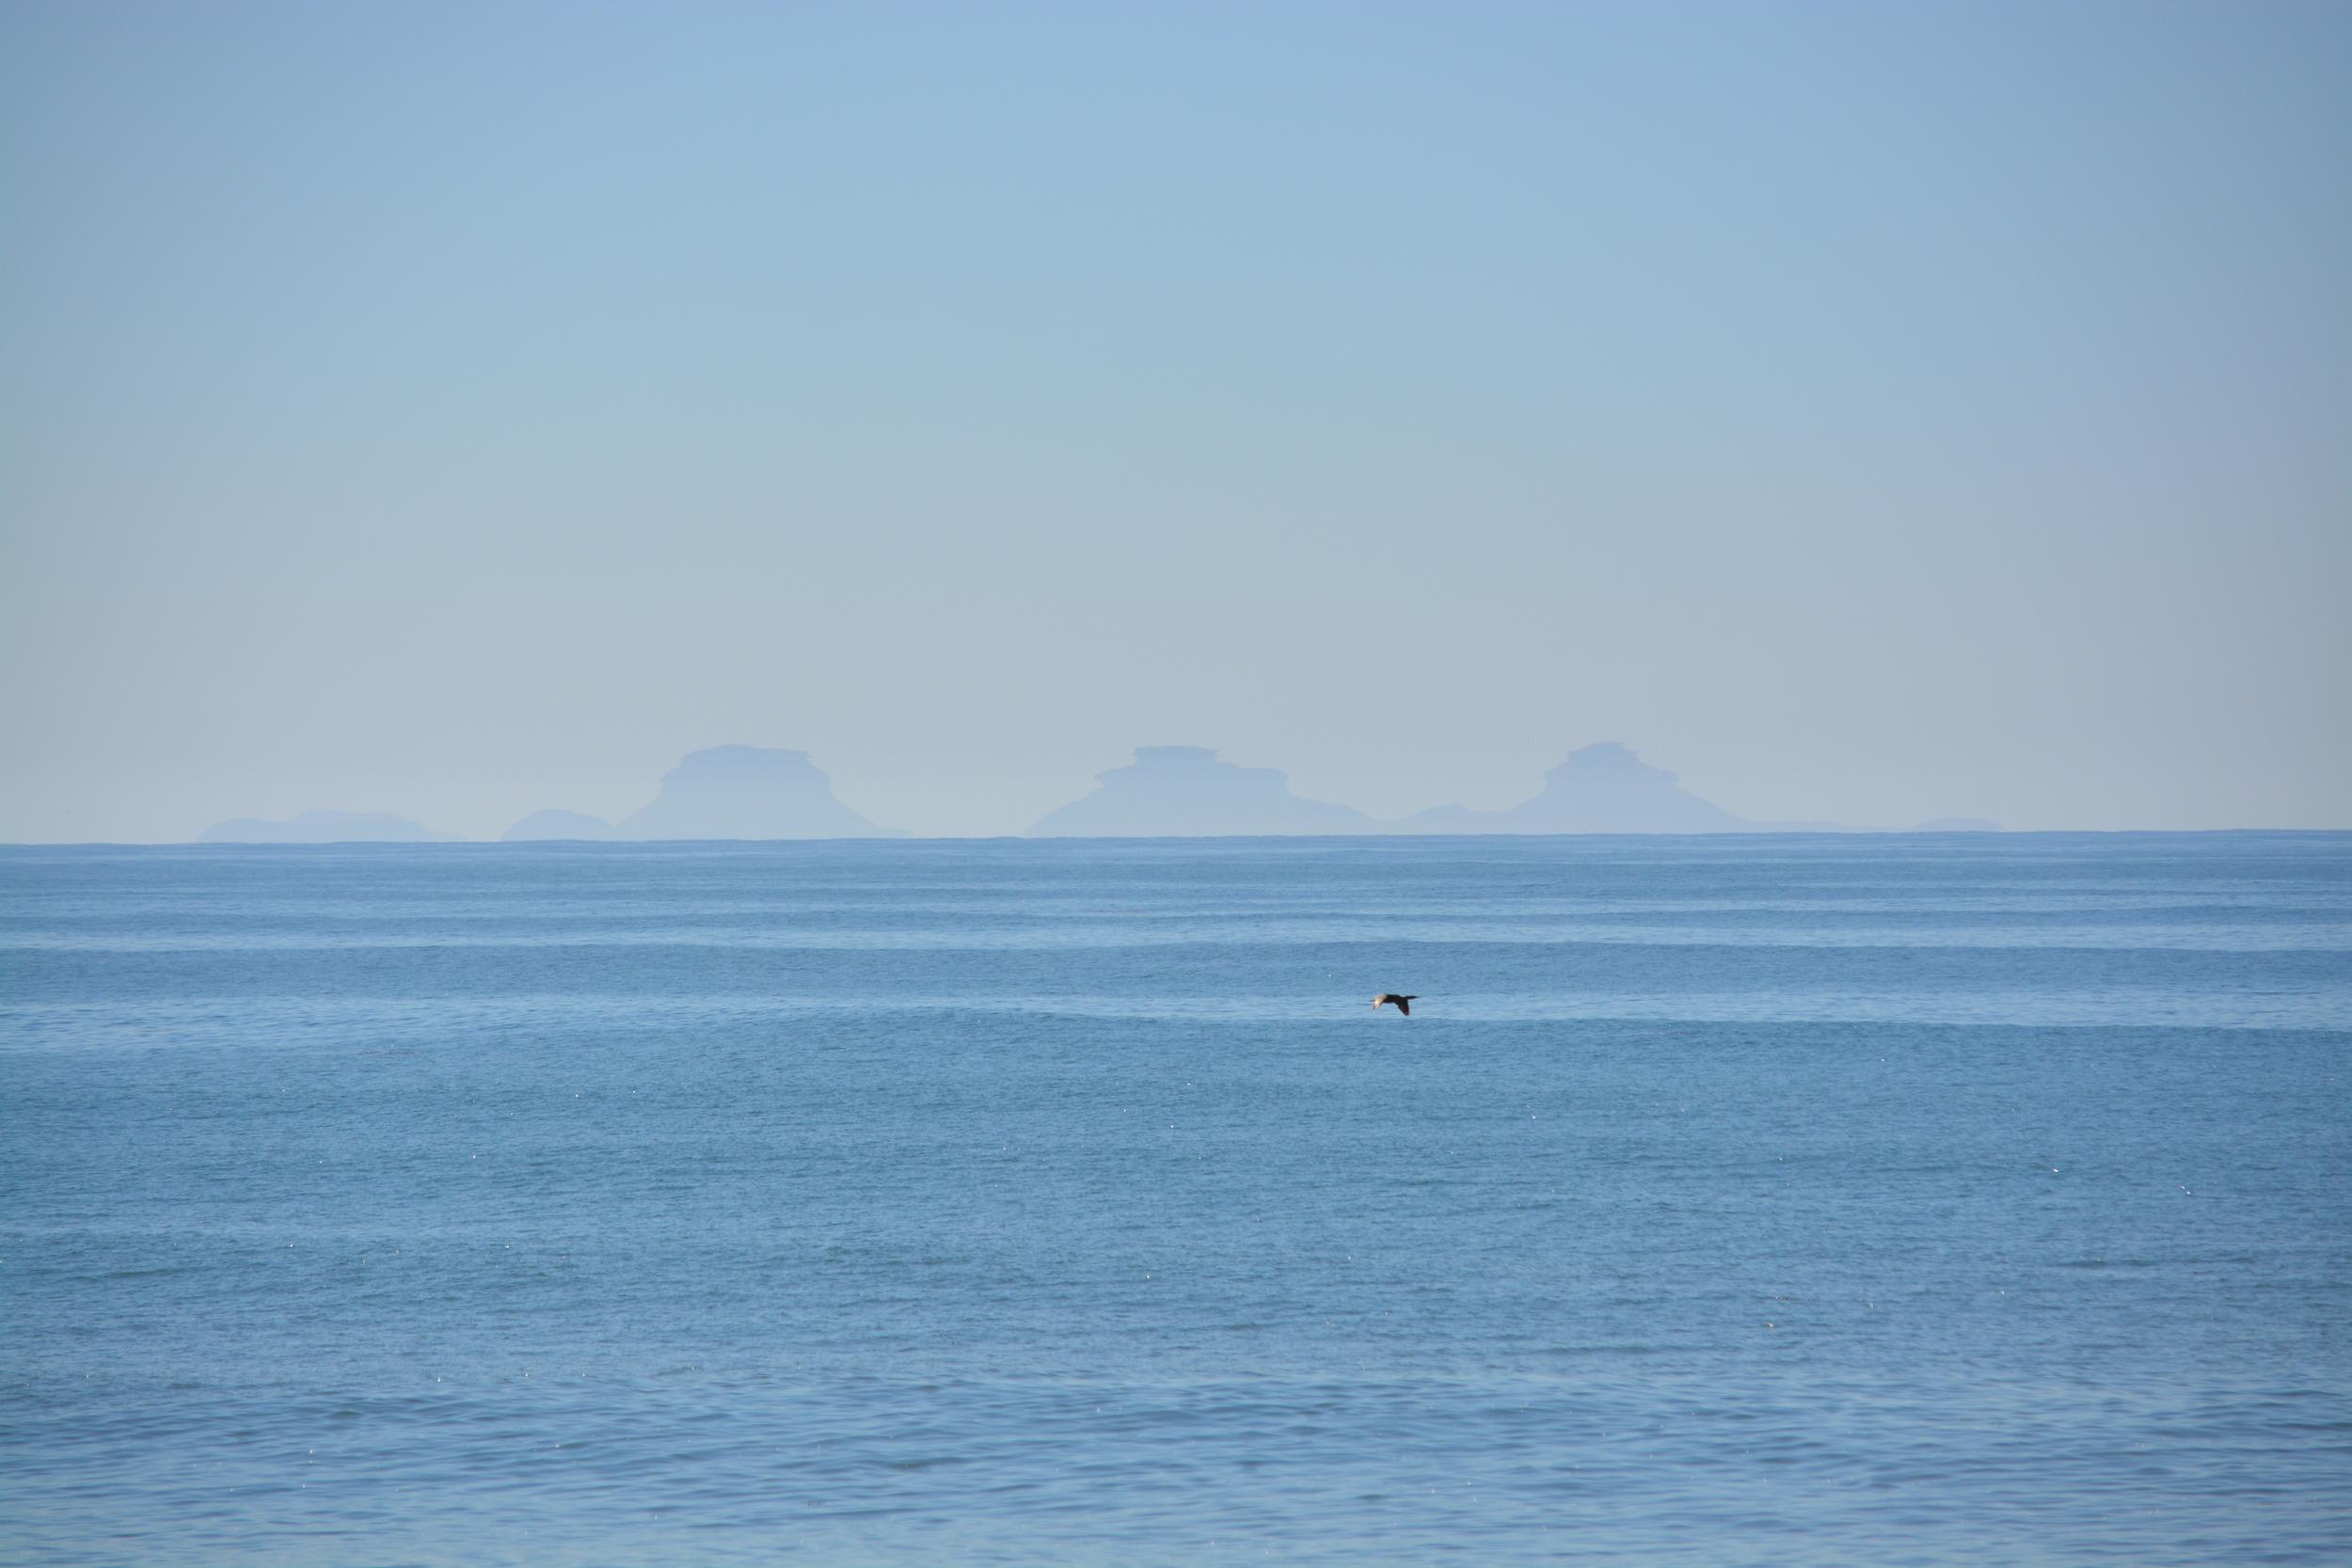 Baja California 10-5-13 Shipwrecks Surfing Adventure Ocean Experience Surf School San Diego (57).JPG